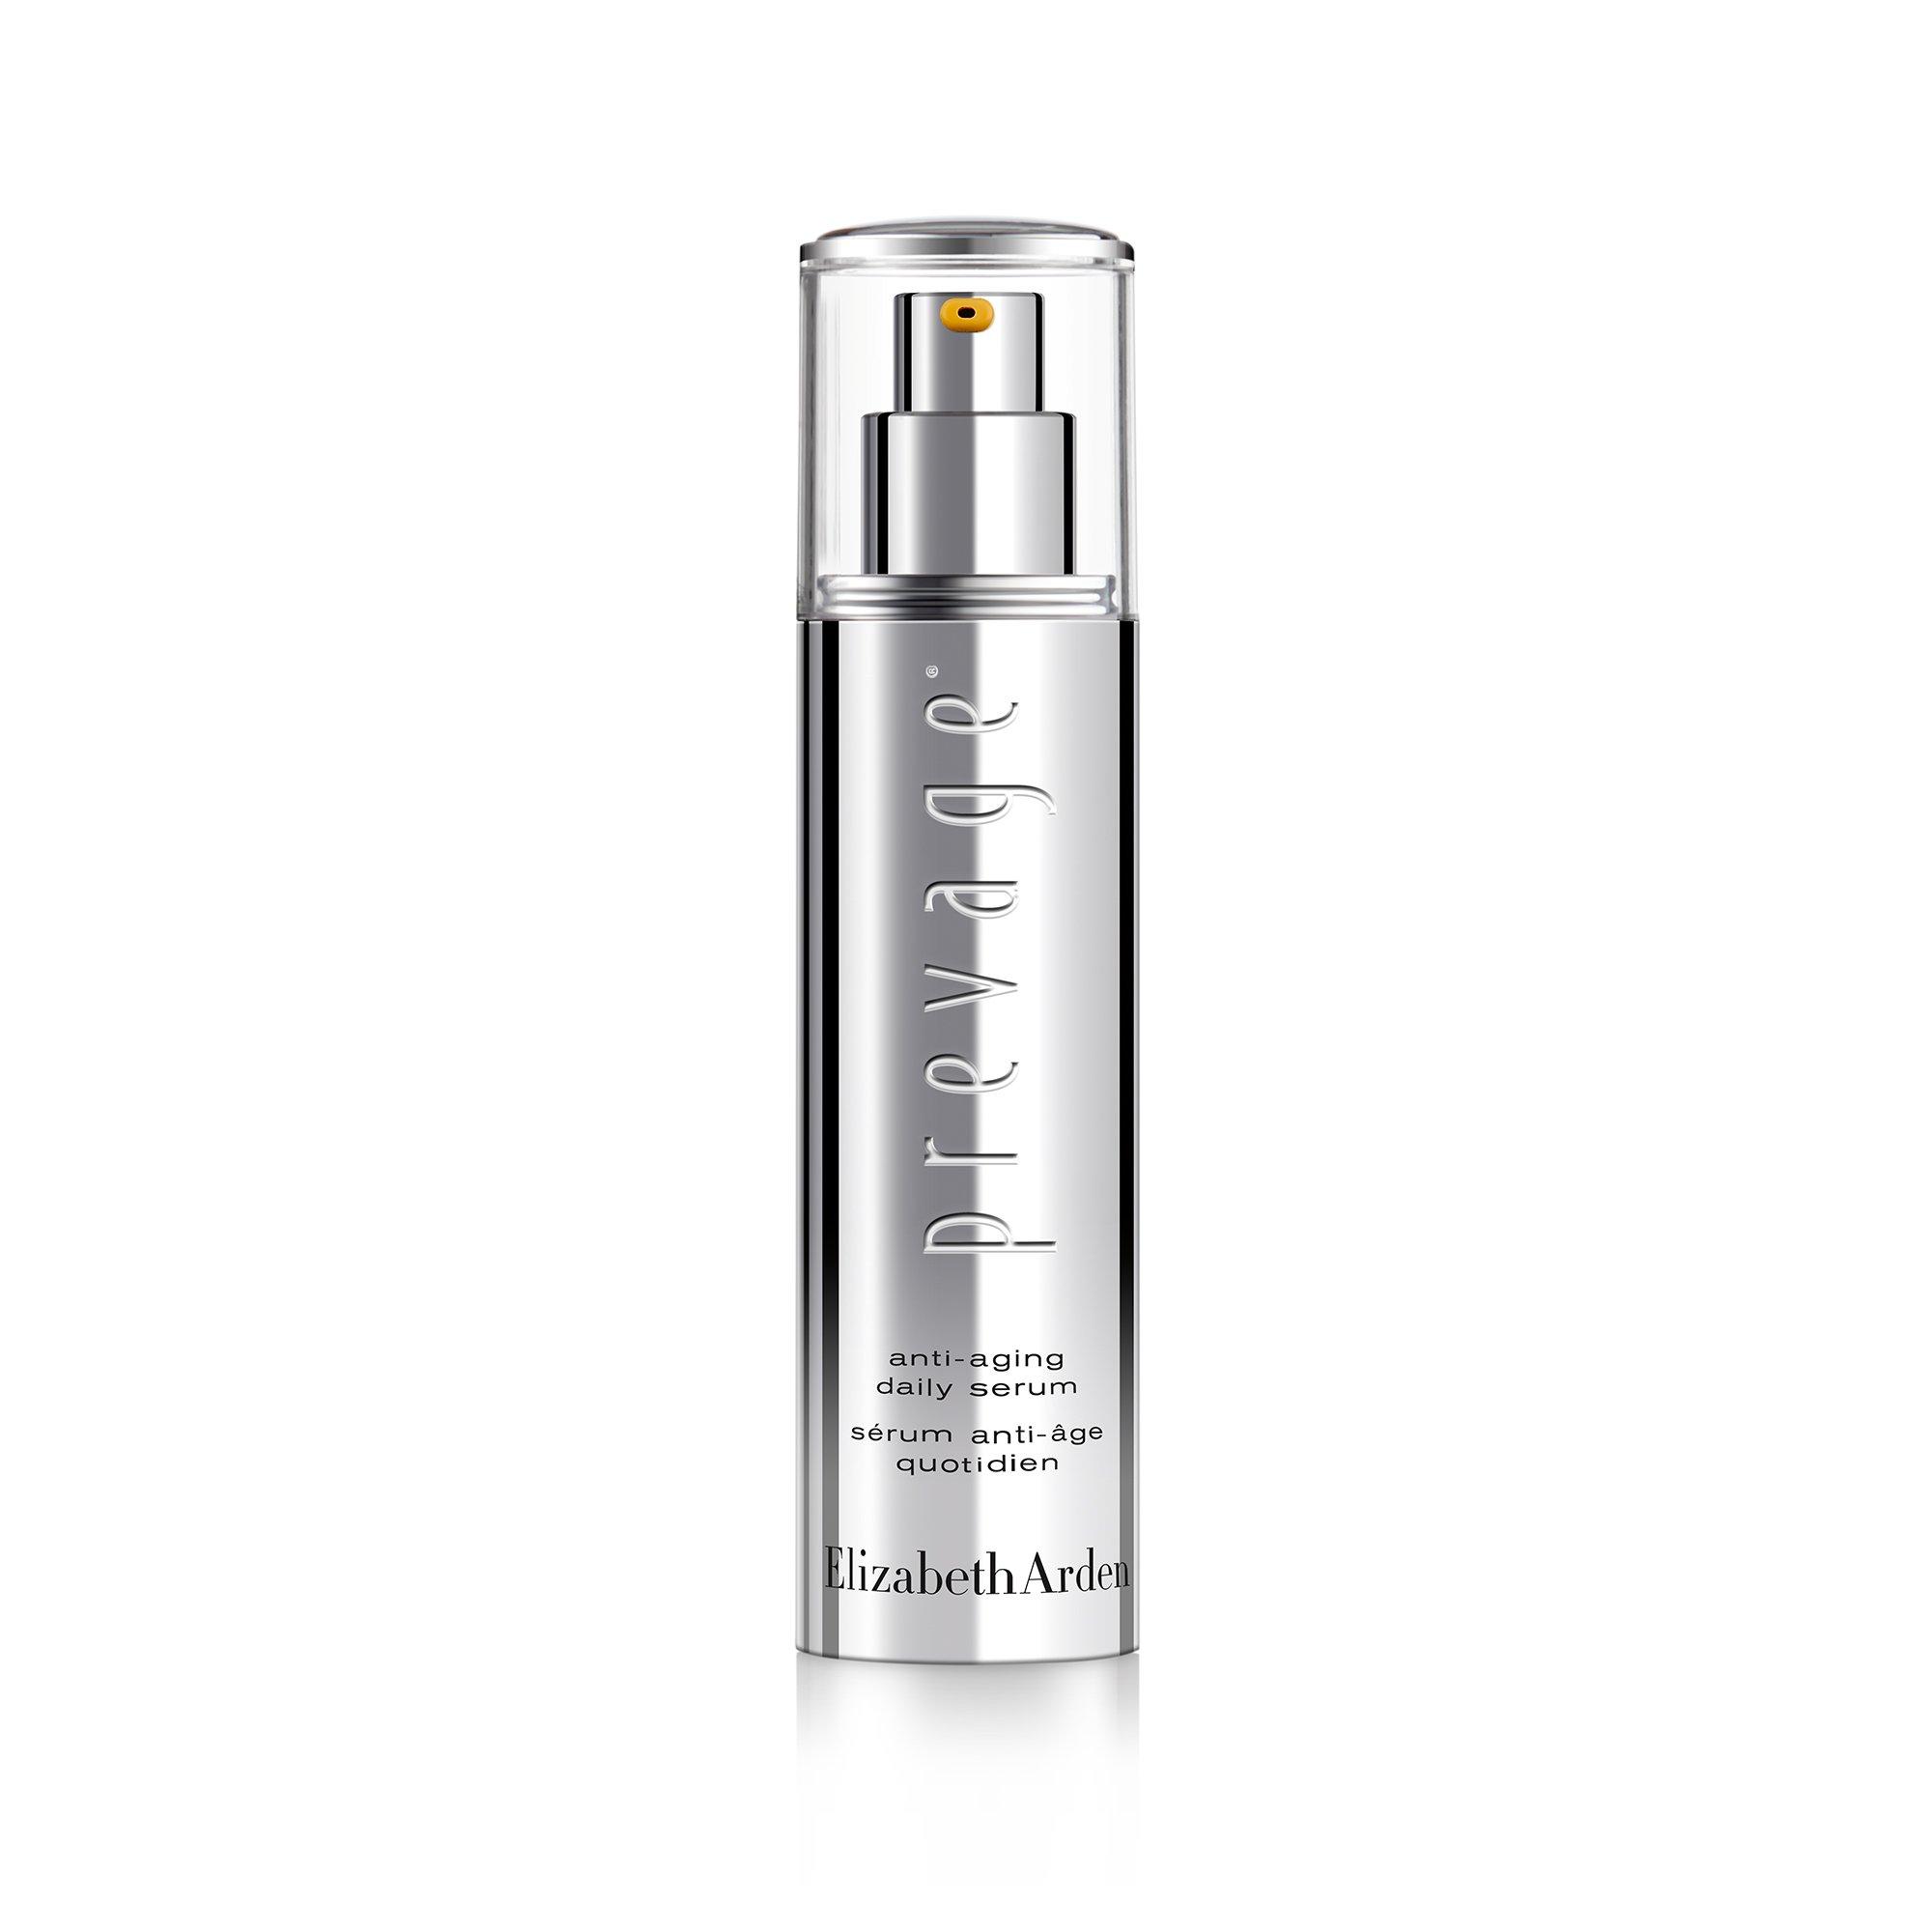 Prevage Anti-Aging Daily Serum by Elizabeth Arden for Women - 1.7 oz Serum Hydragenist Moisturizing Cream (For Dry To Very Dry Skin)-50ml/1.7oz